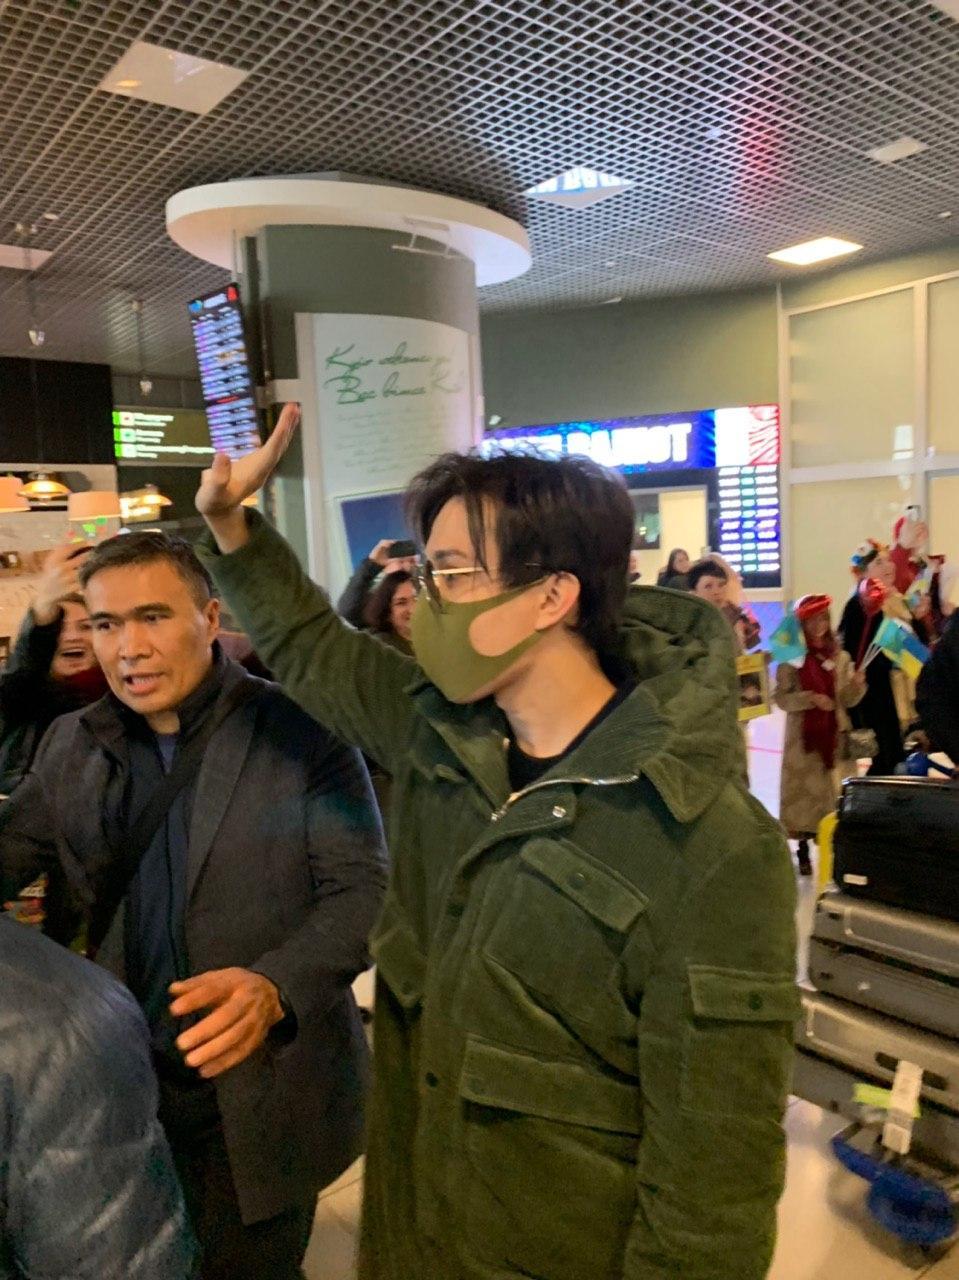 «Кохаемо Димаш!»: Украинские фанаты горячо встретили Димаша